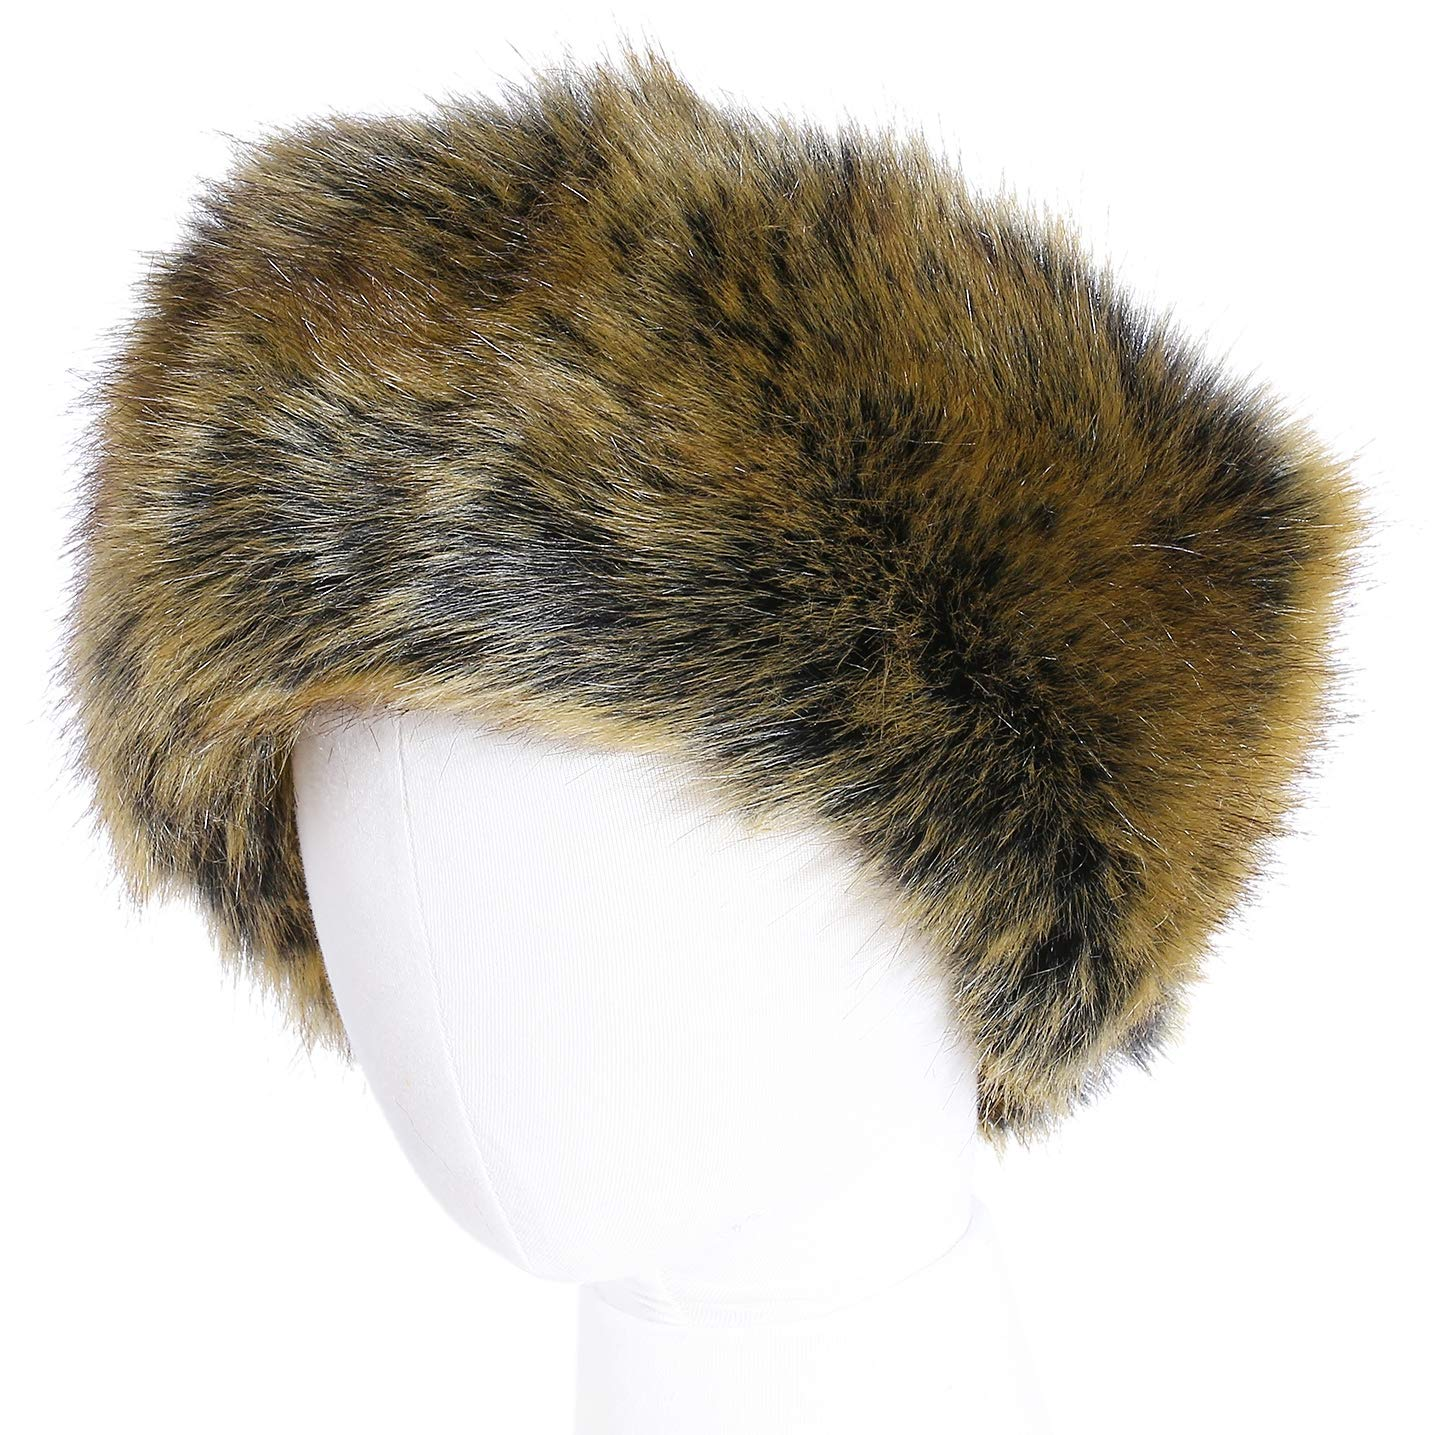 FFaux Fur Headband with Elastic for Women's Winter Earwarmer Earmuff (one size,Brown)